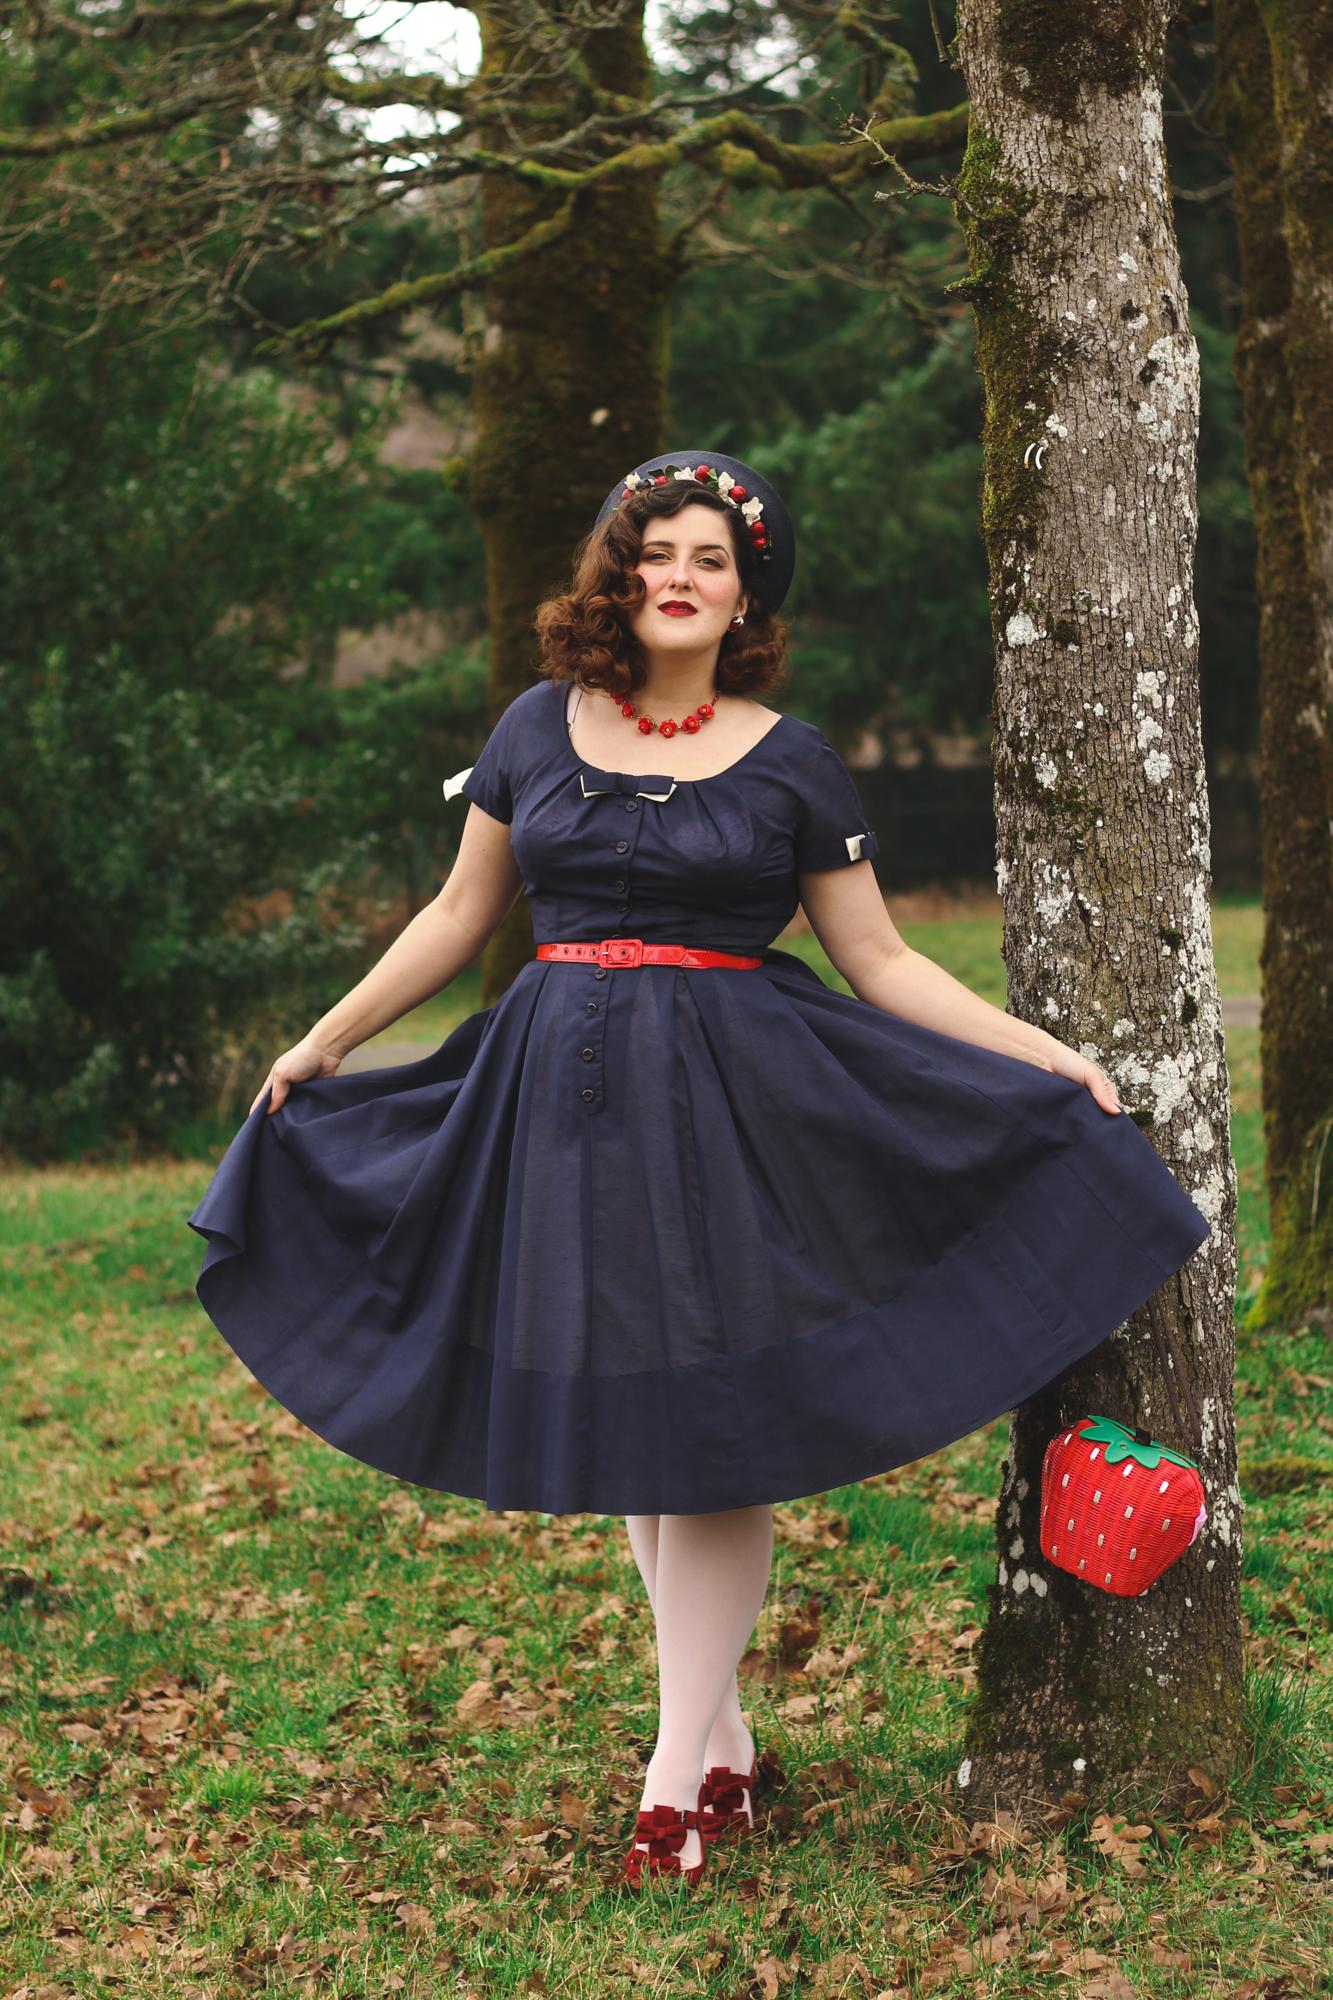 Vintage Snow White Disneybounding Outfit